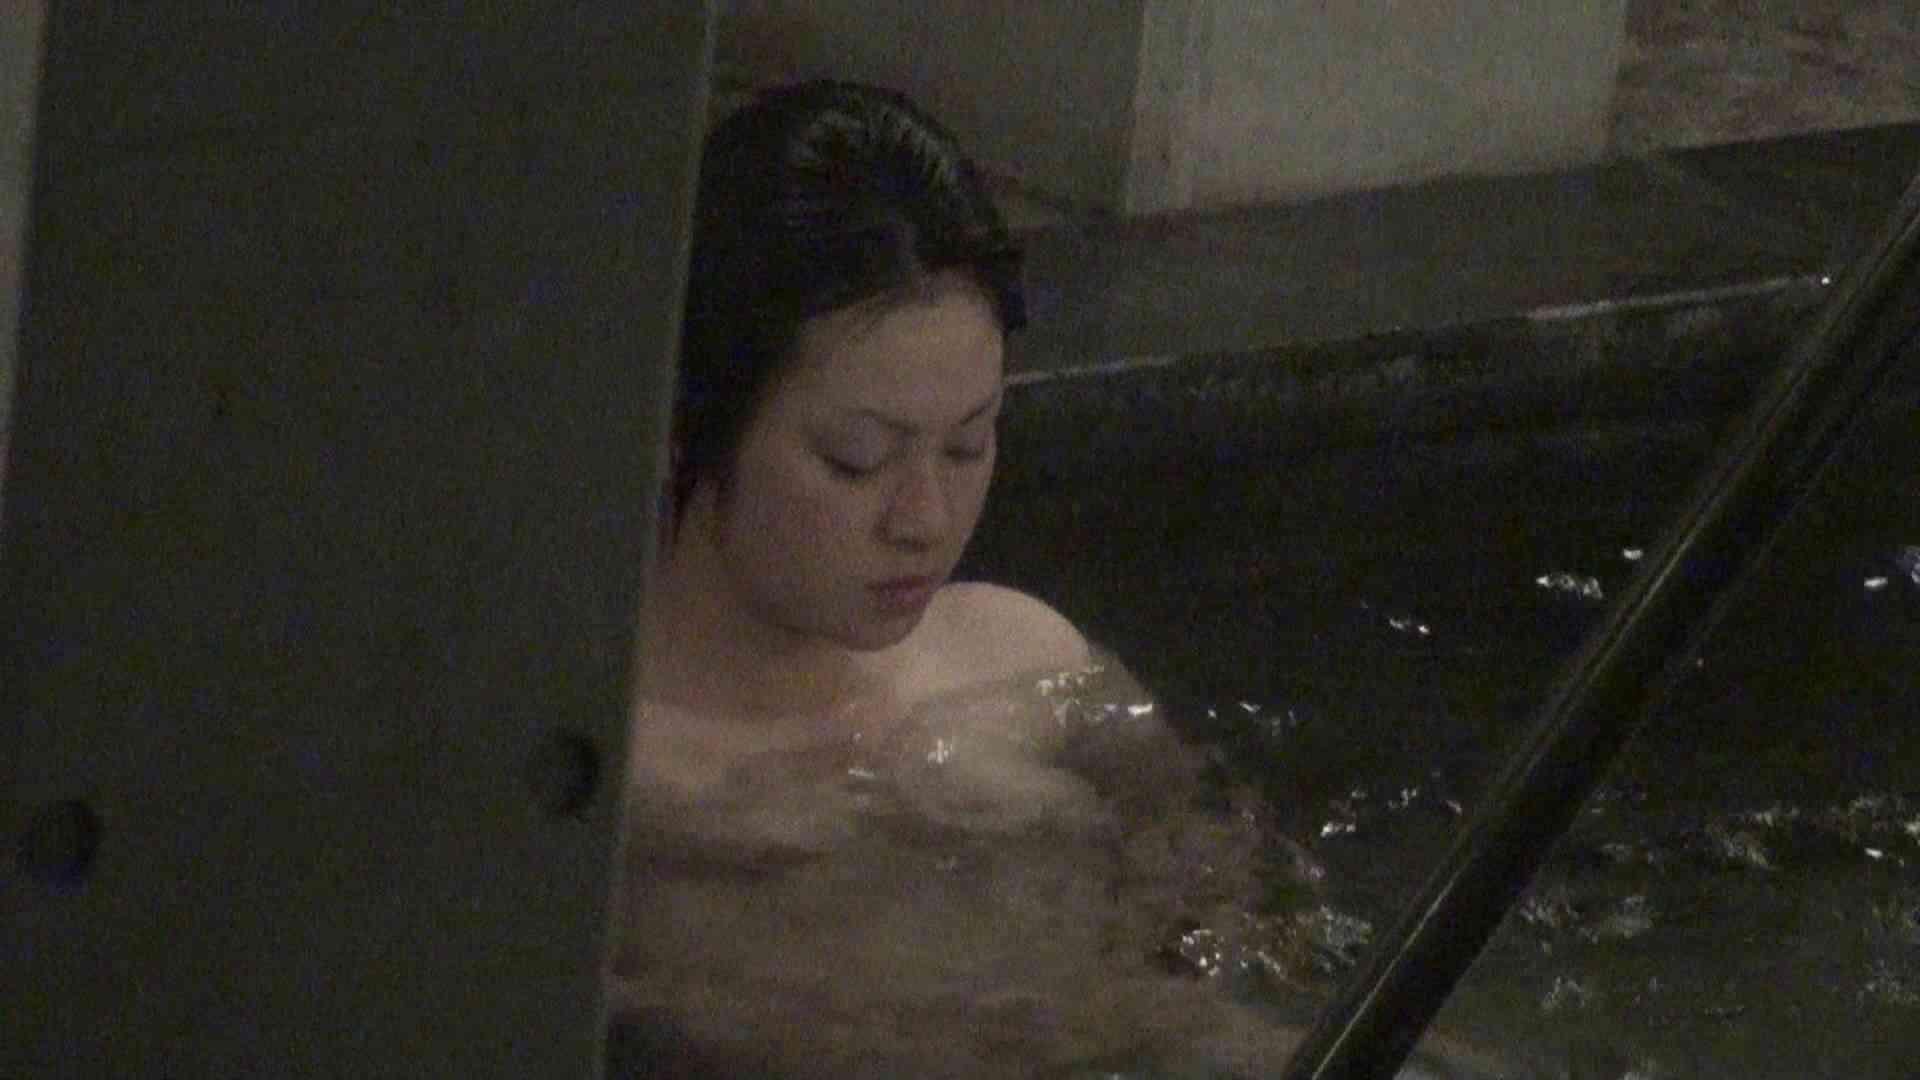 Aquaな露天風呂Vol.338 露天風呂編  82PIX 76